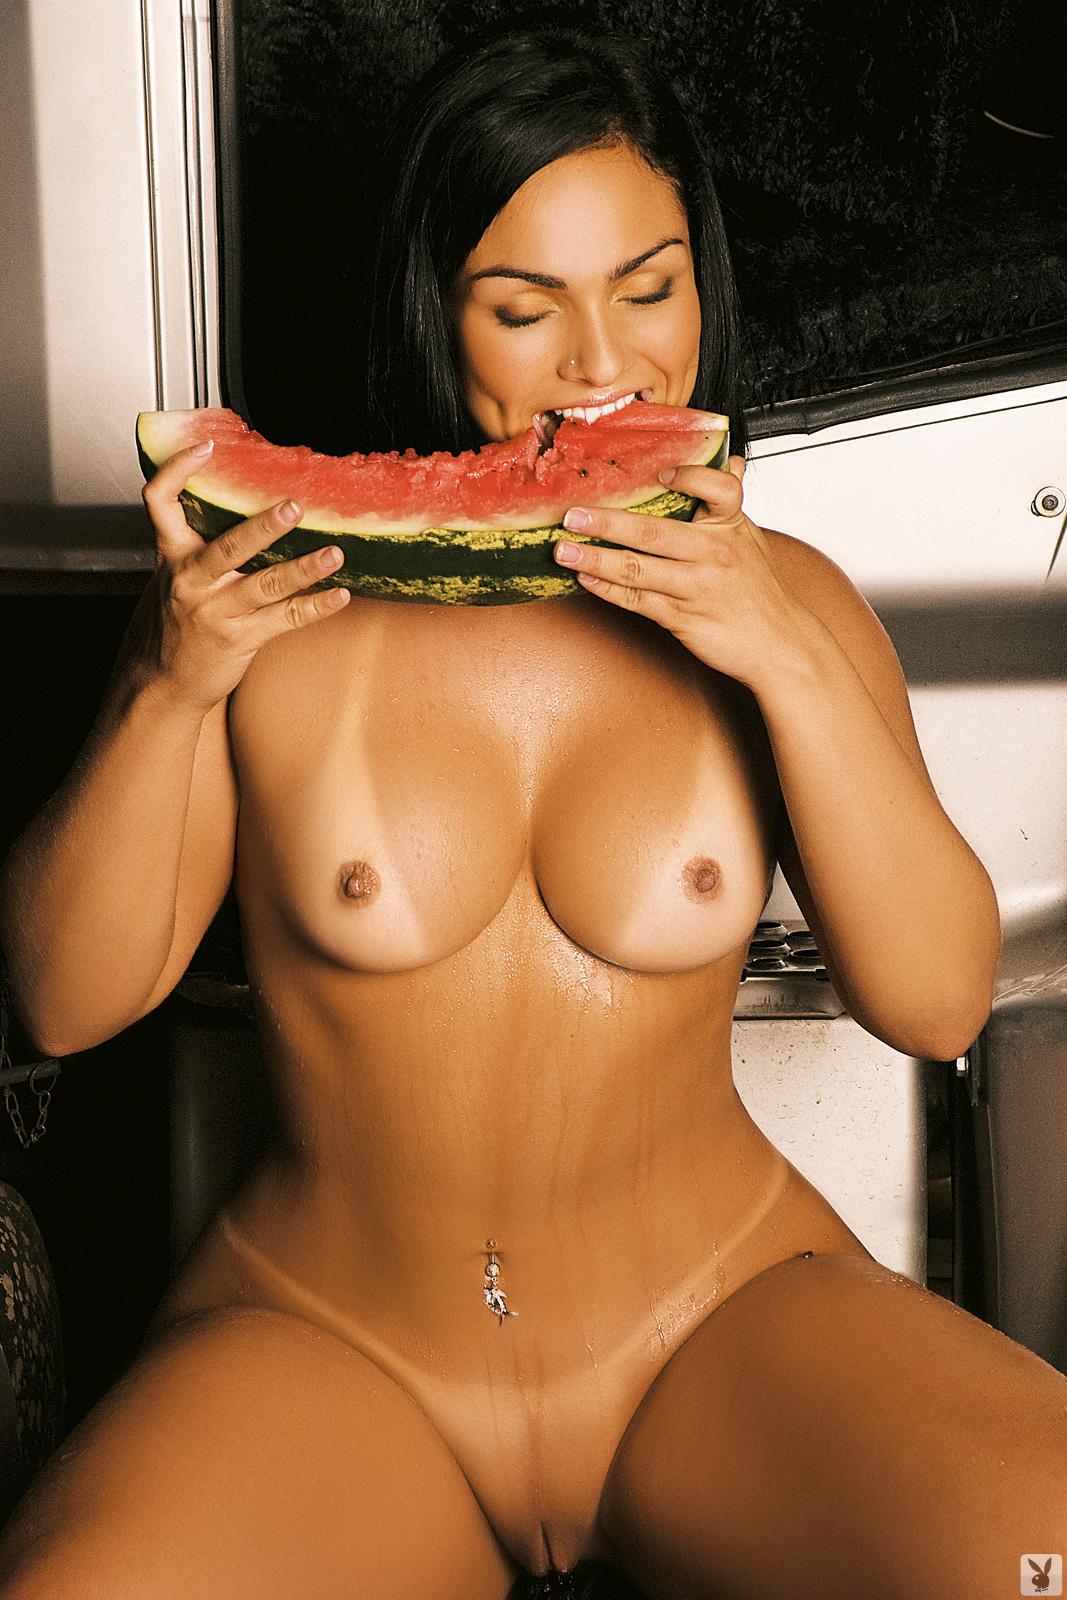 Andressa soares playboy nude